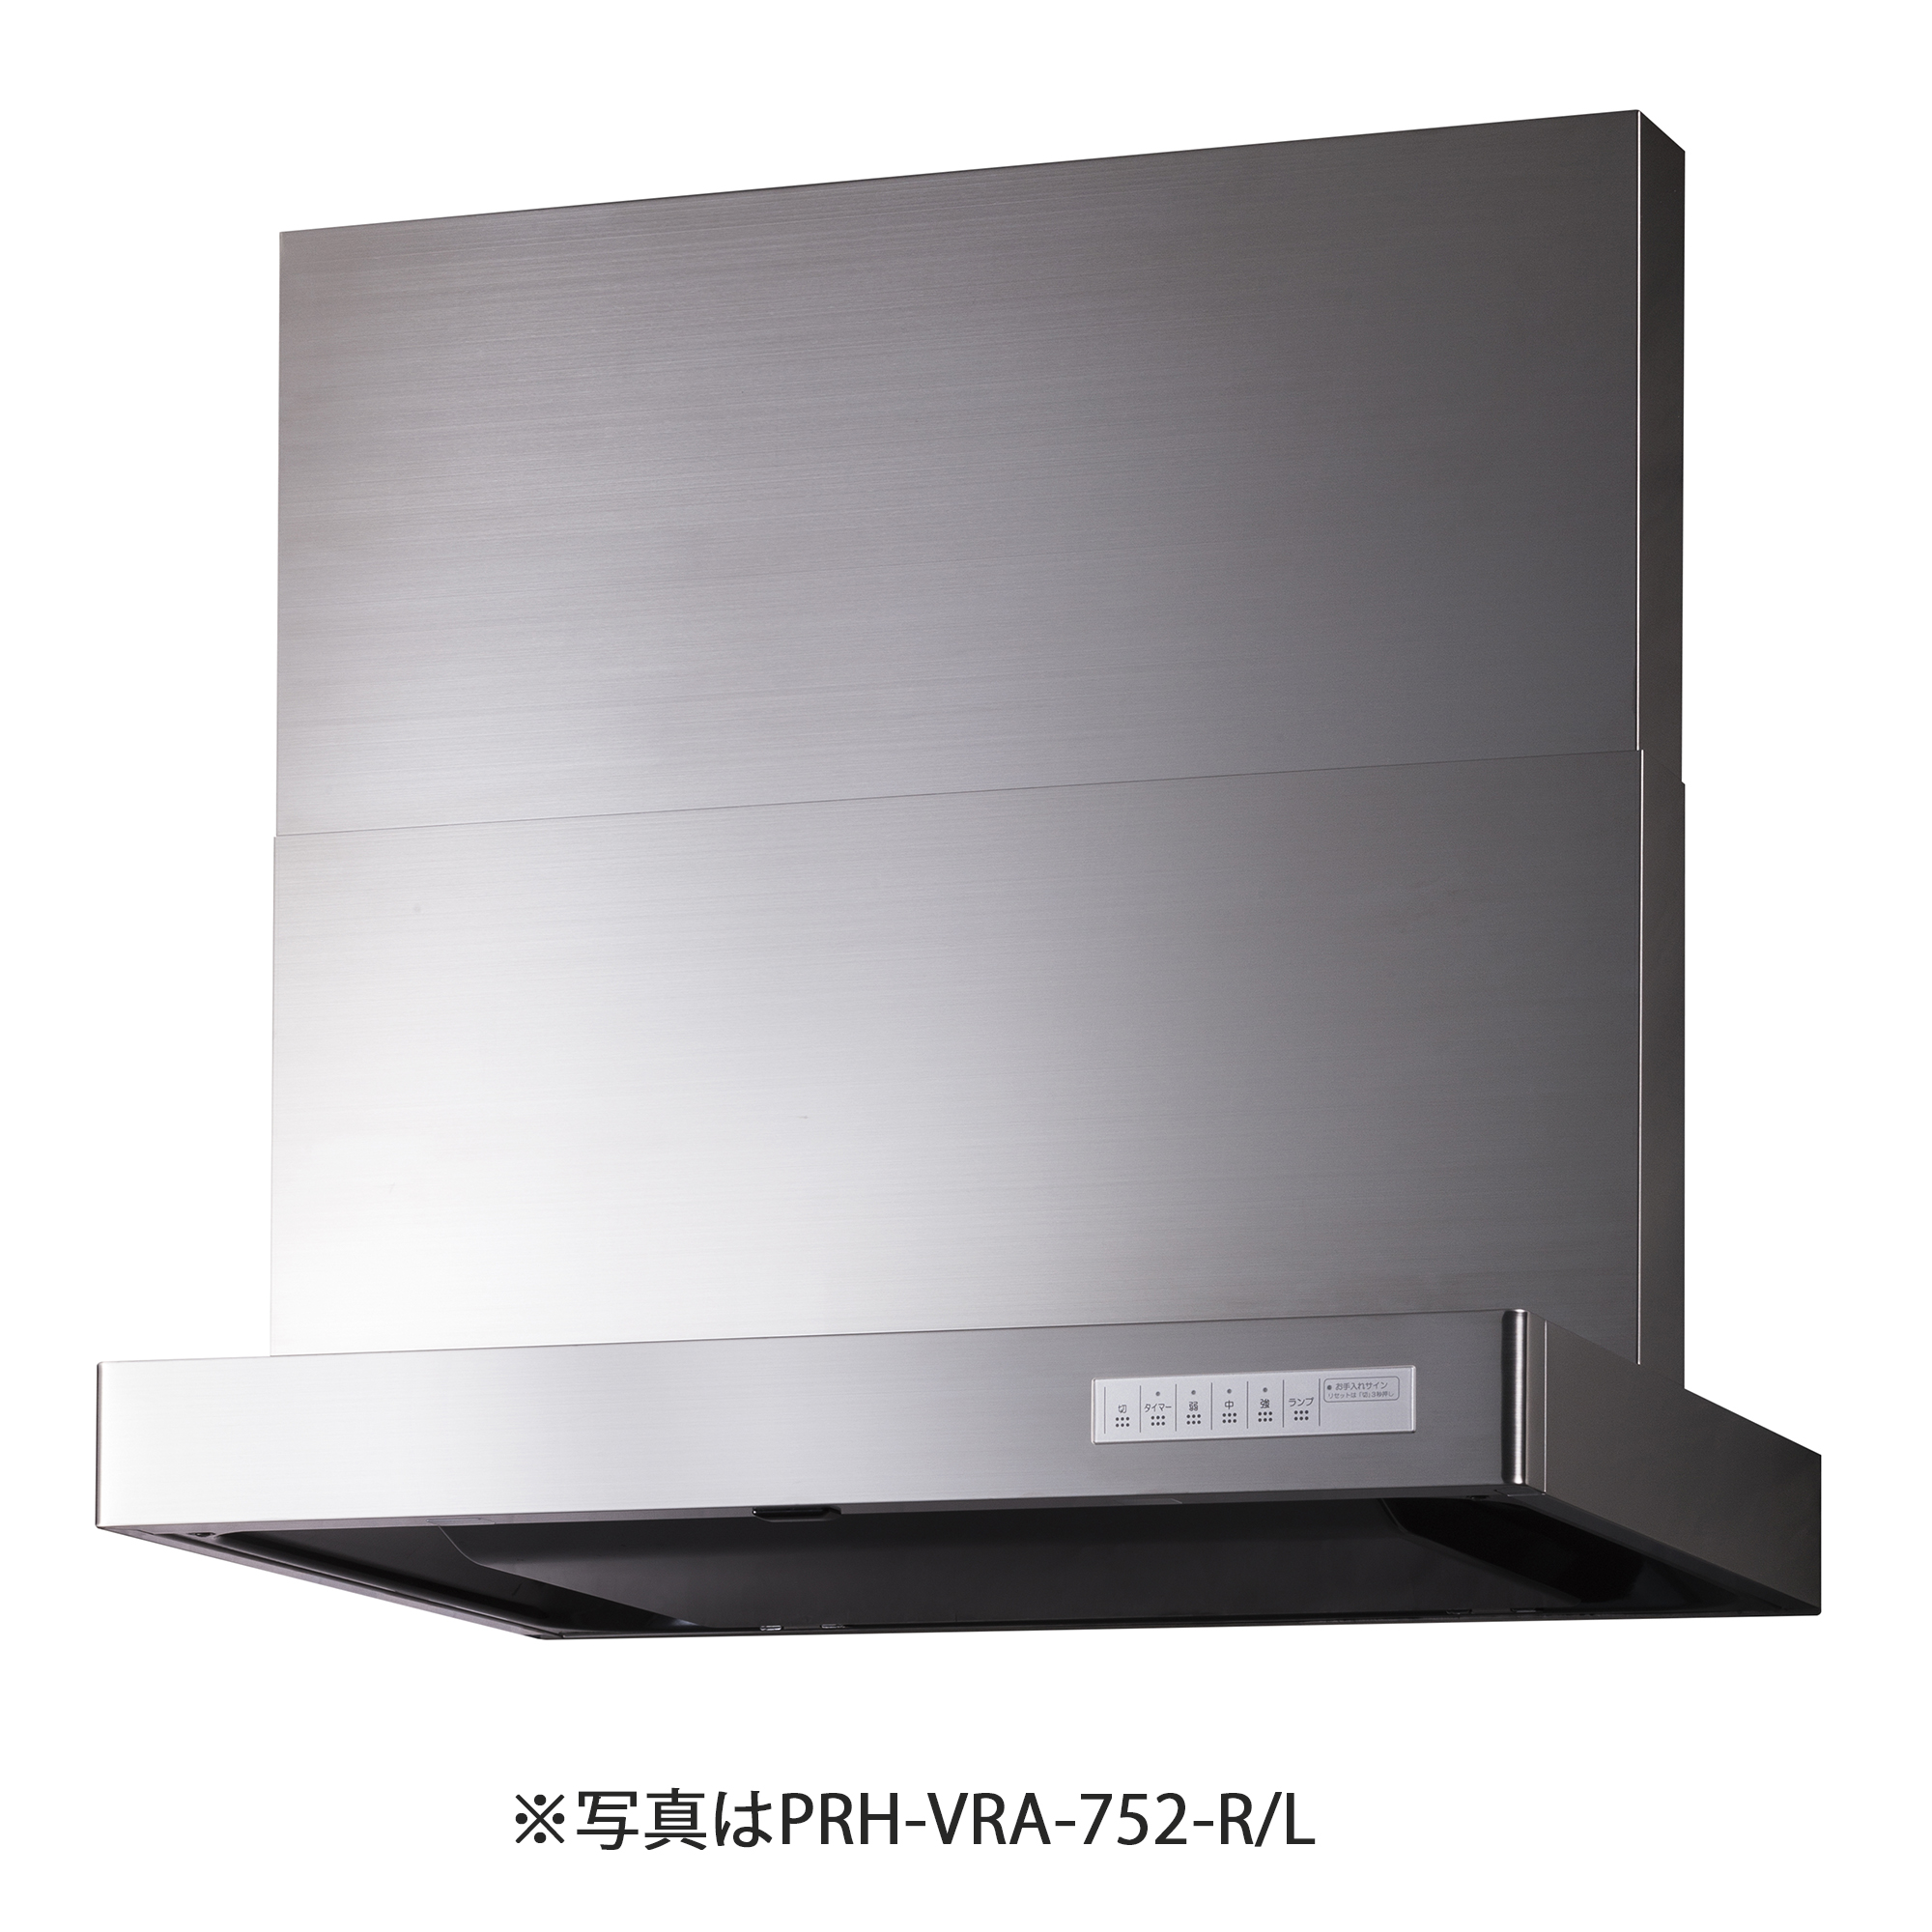 PRH-VRA902-R/L